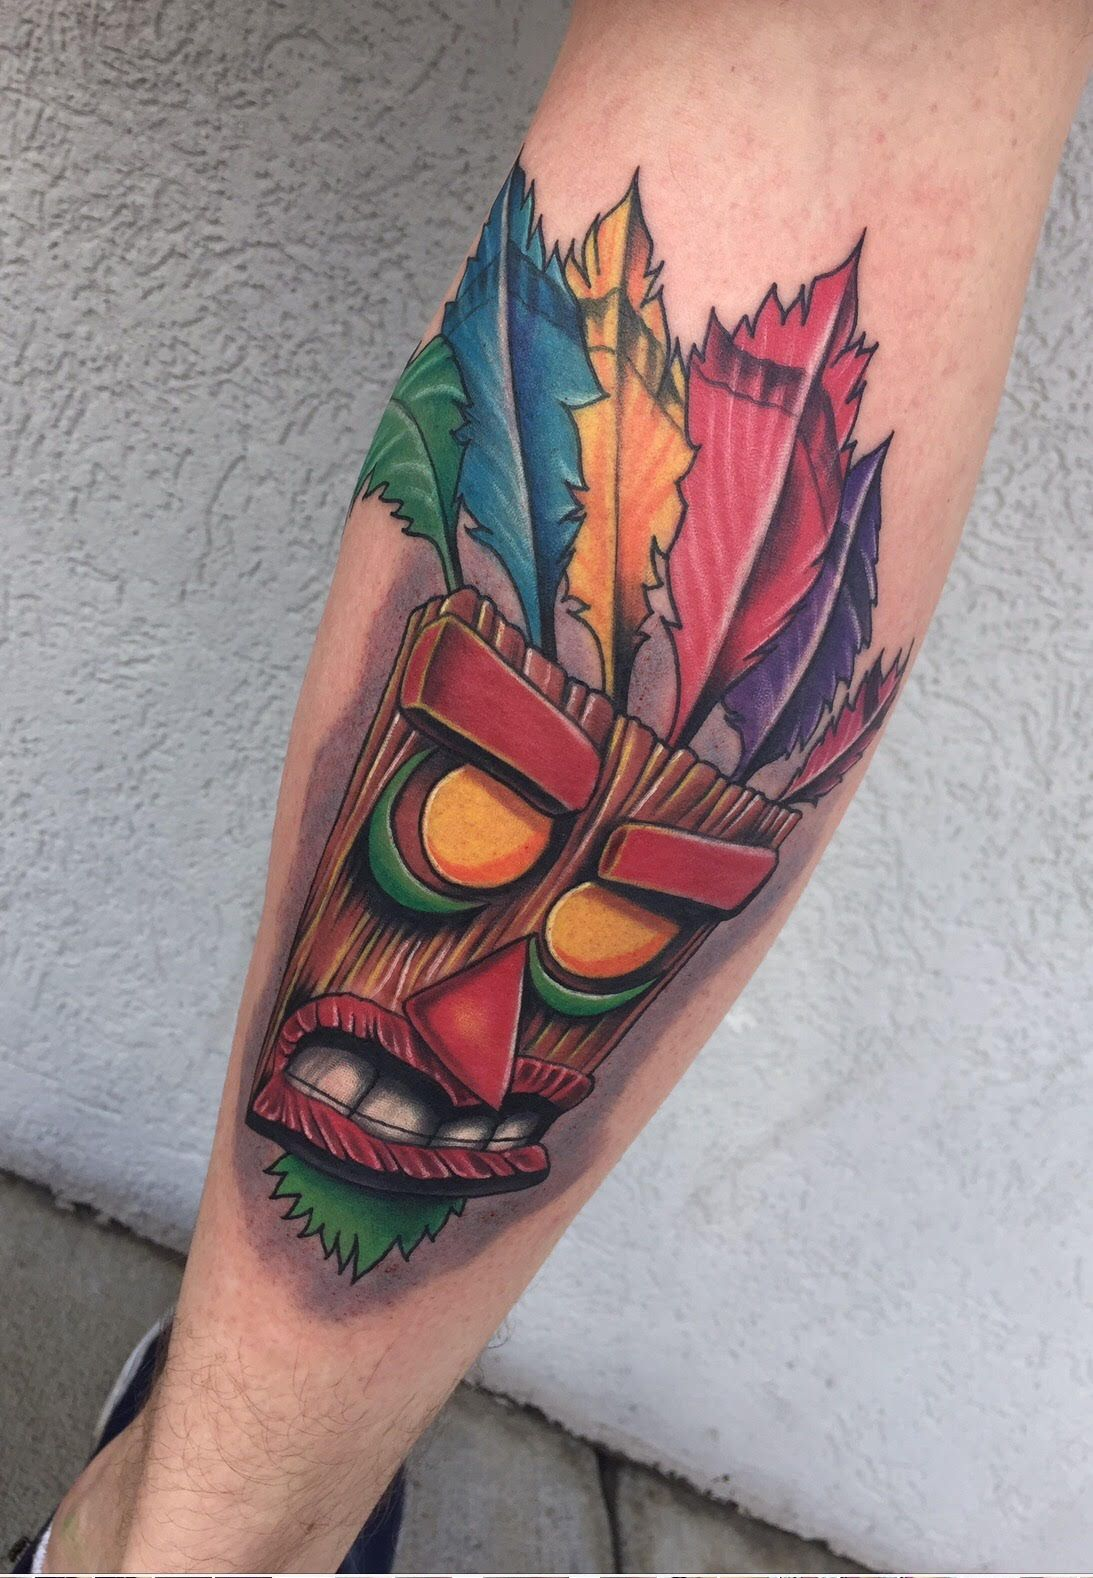 e0940eb83 Crash Bandicoot Aku Aku Tattoo || Evolution Ink Studio || Fayetteville, NC  || Artist: Joan